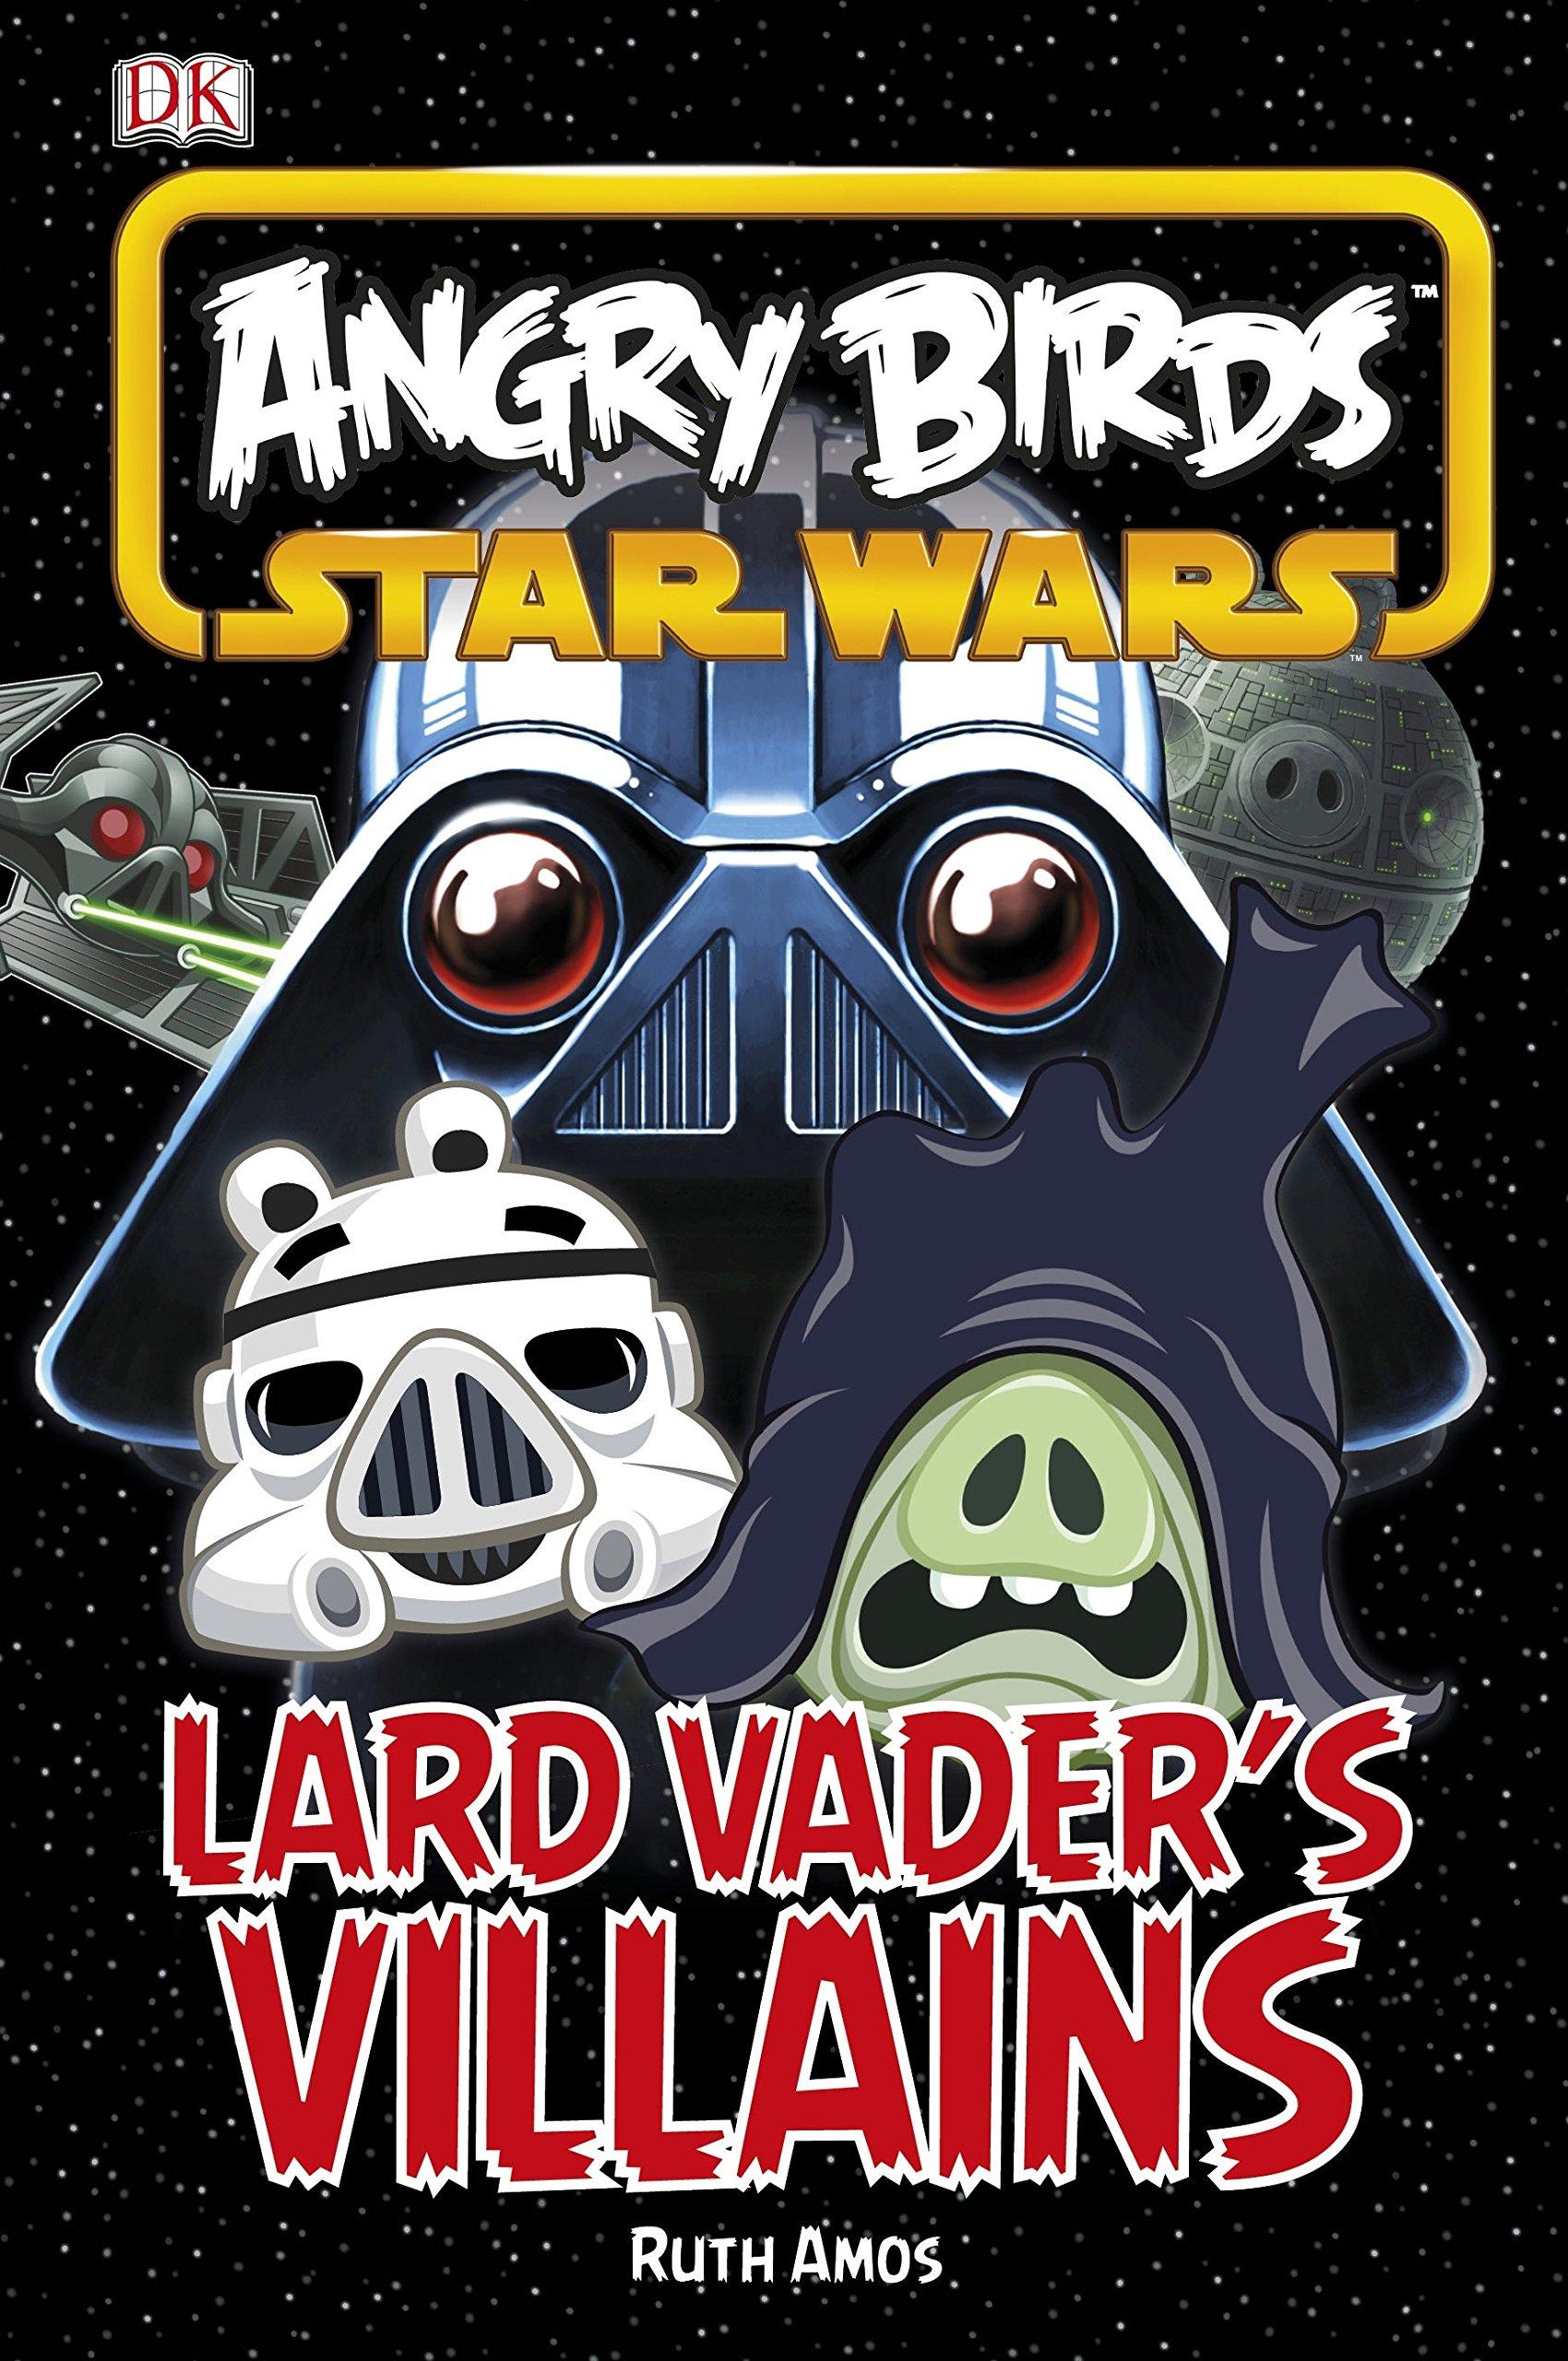 Angry Birds Star Wars: Lard Vader's Villains